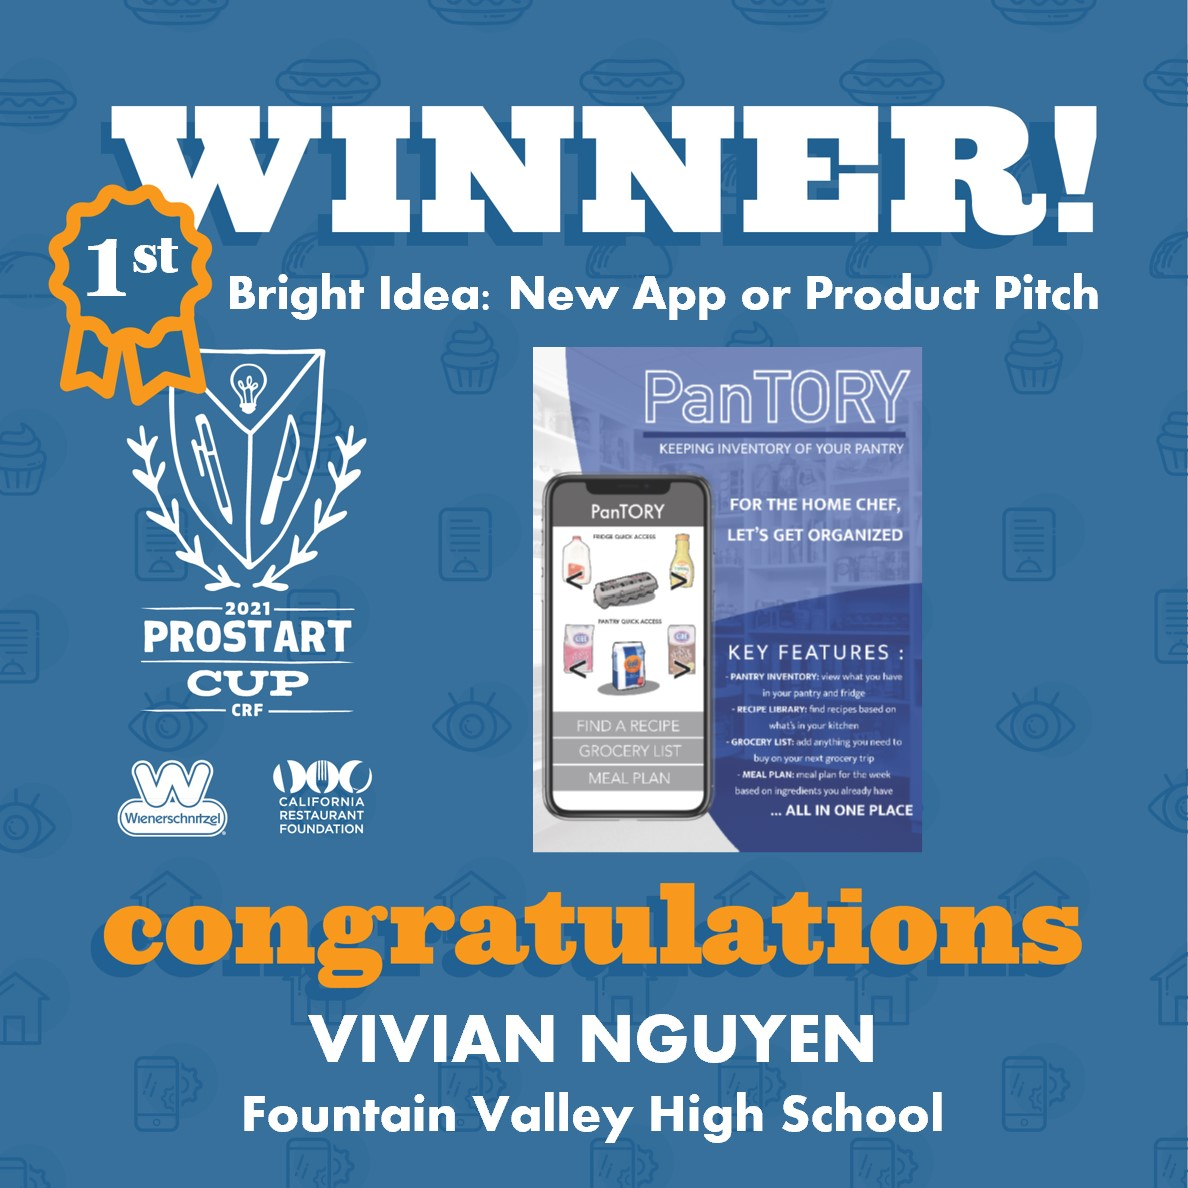 2021 ProStart Winner - Bright Idea: New App + Product Pitch - 1st Place